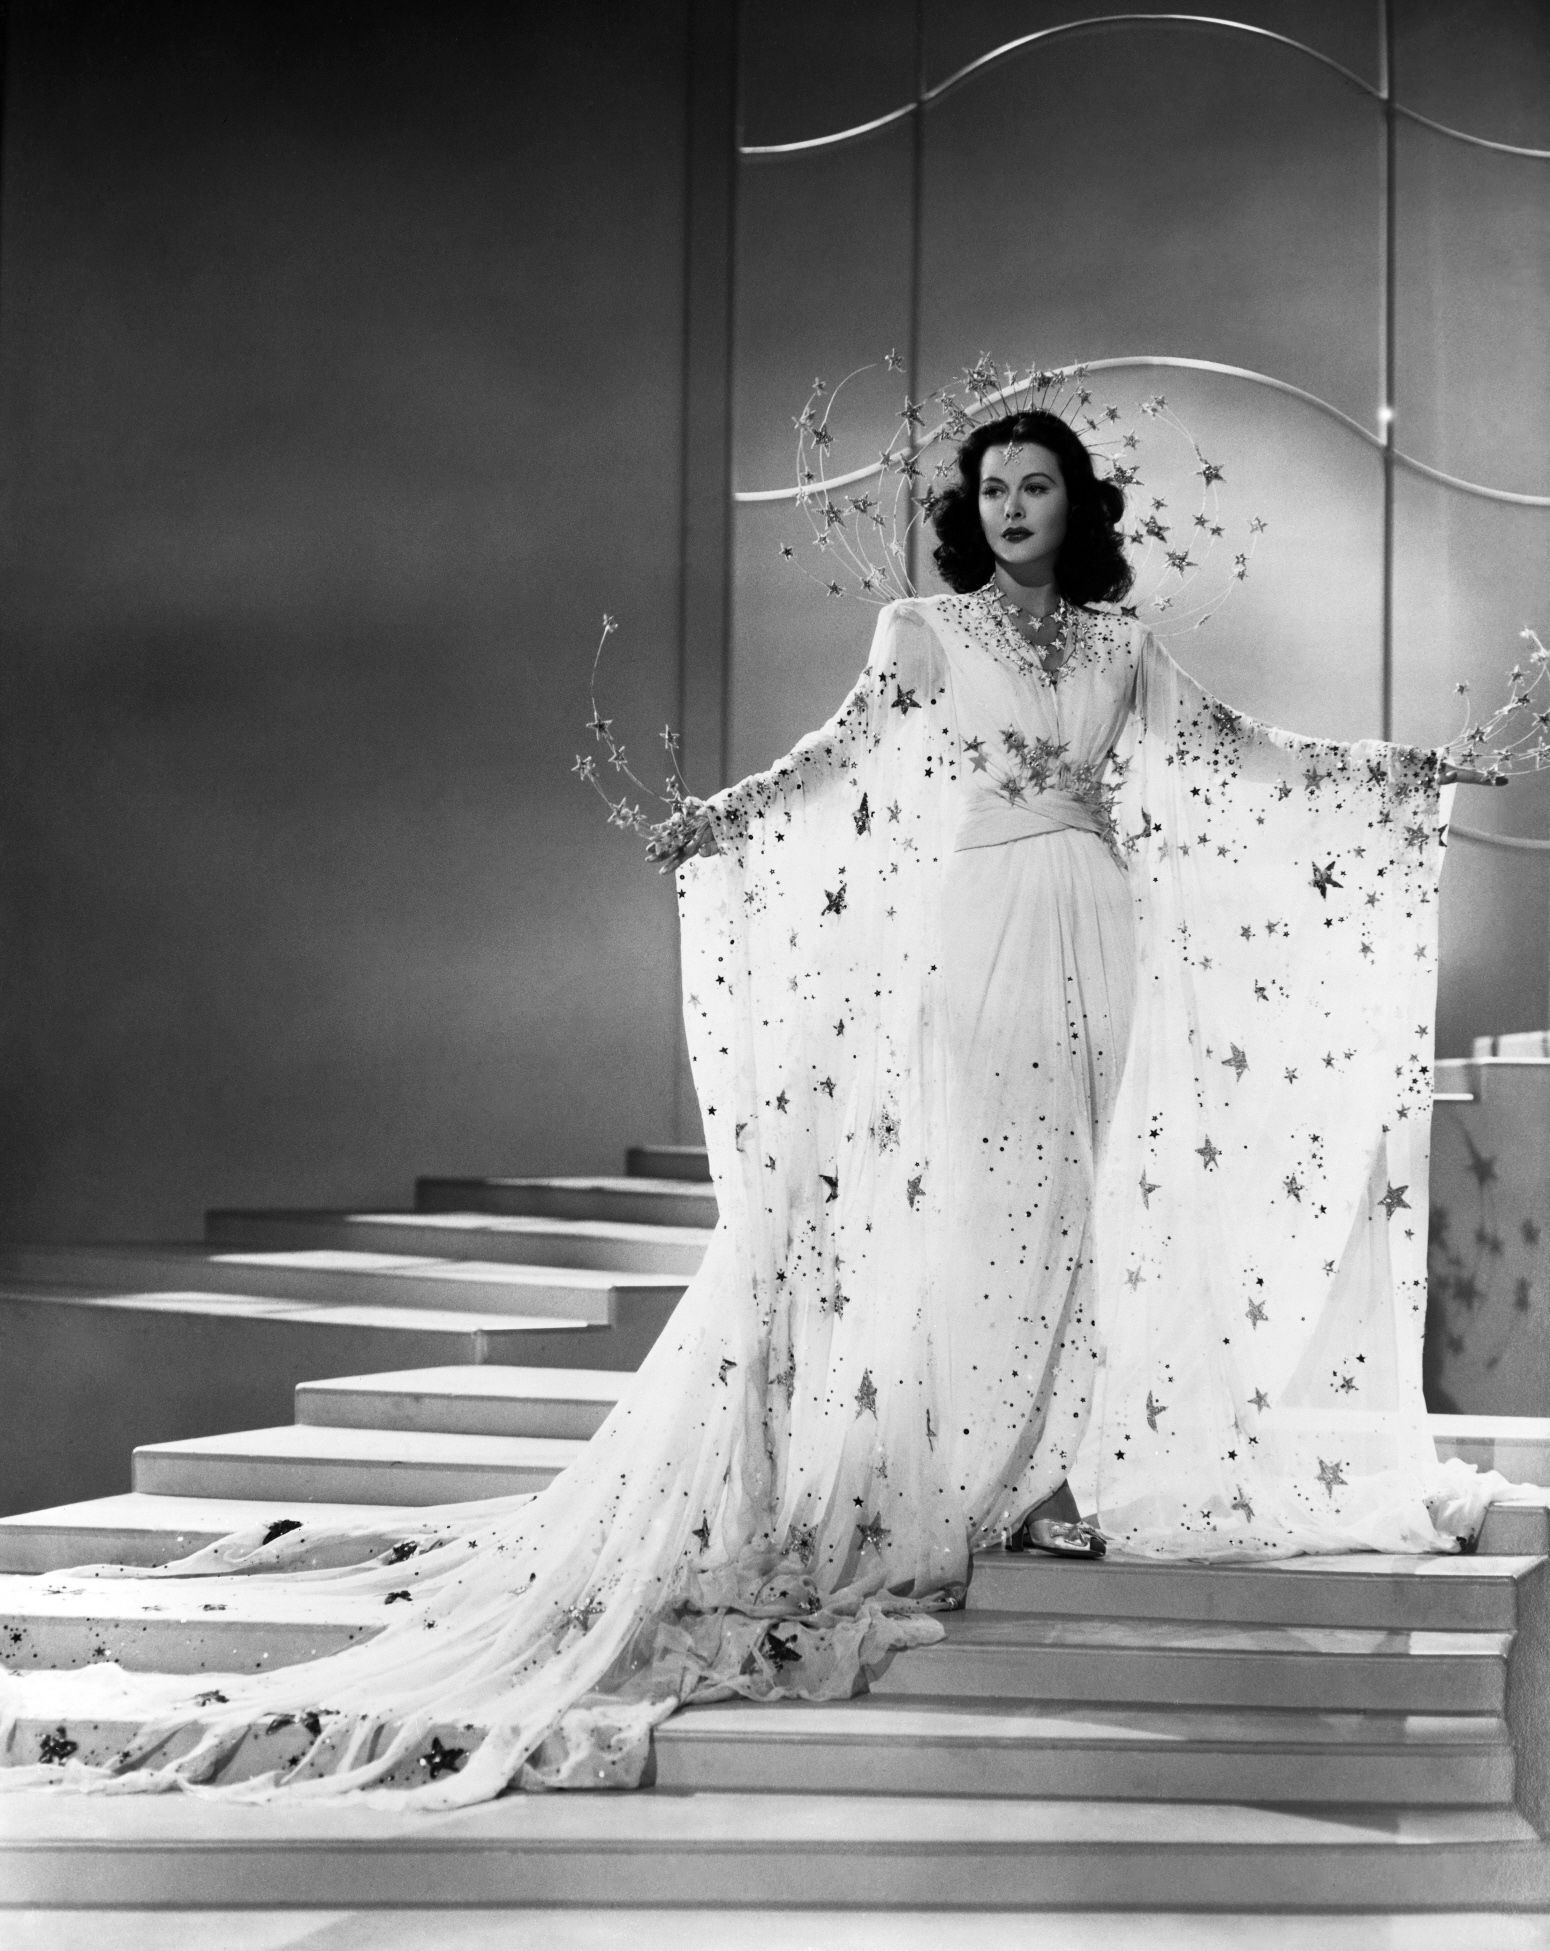 Production Still Hedy Larmarr 1941 Ziegfeld Girls Historical The Little Things She Needs Samara 10b Black